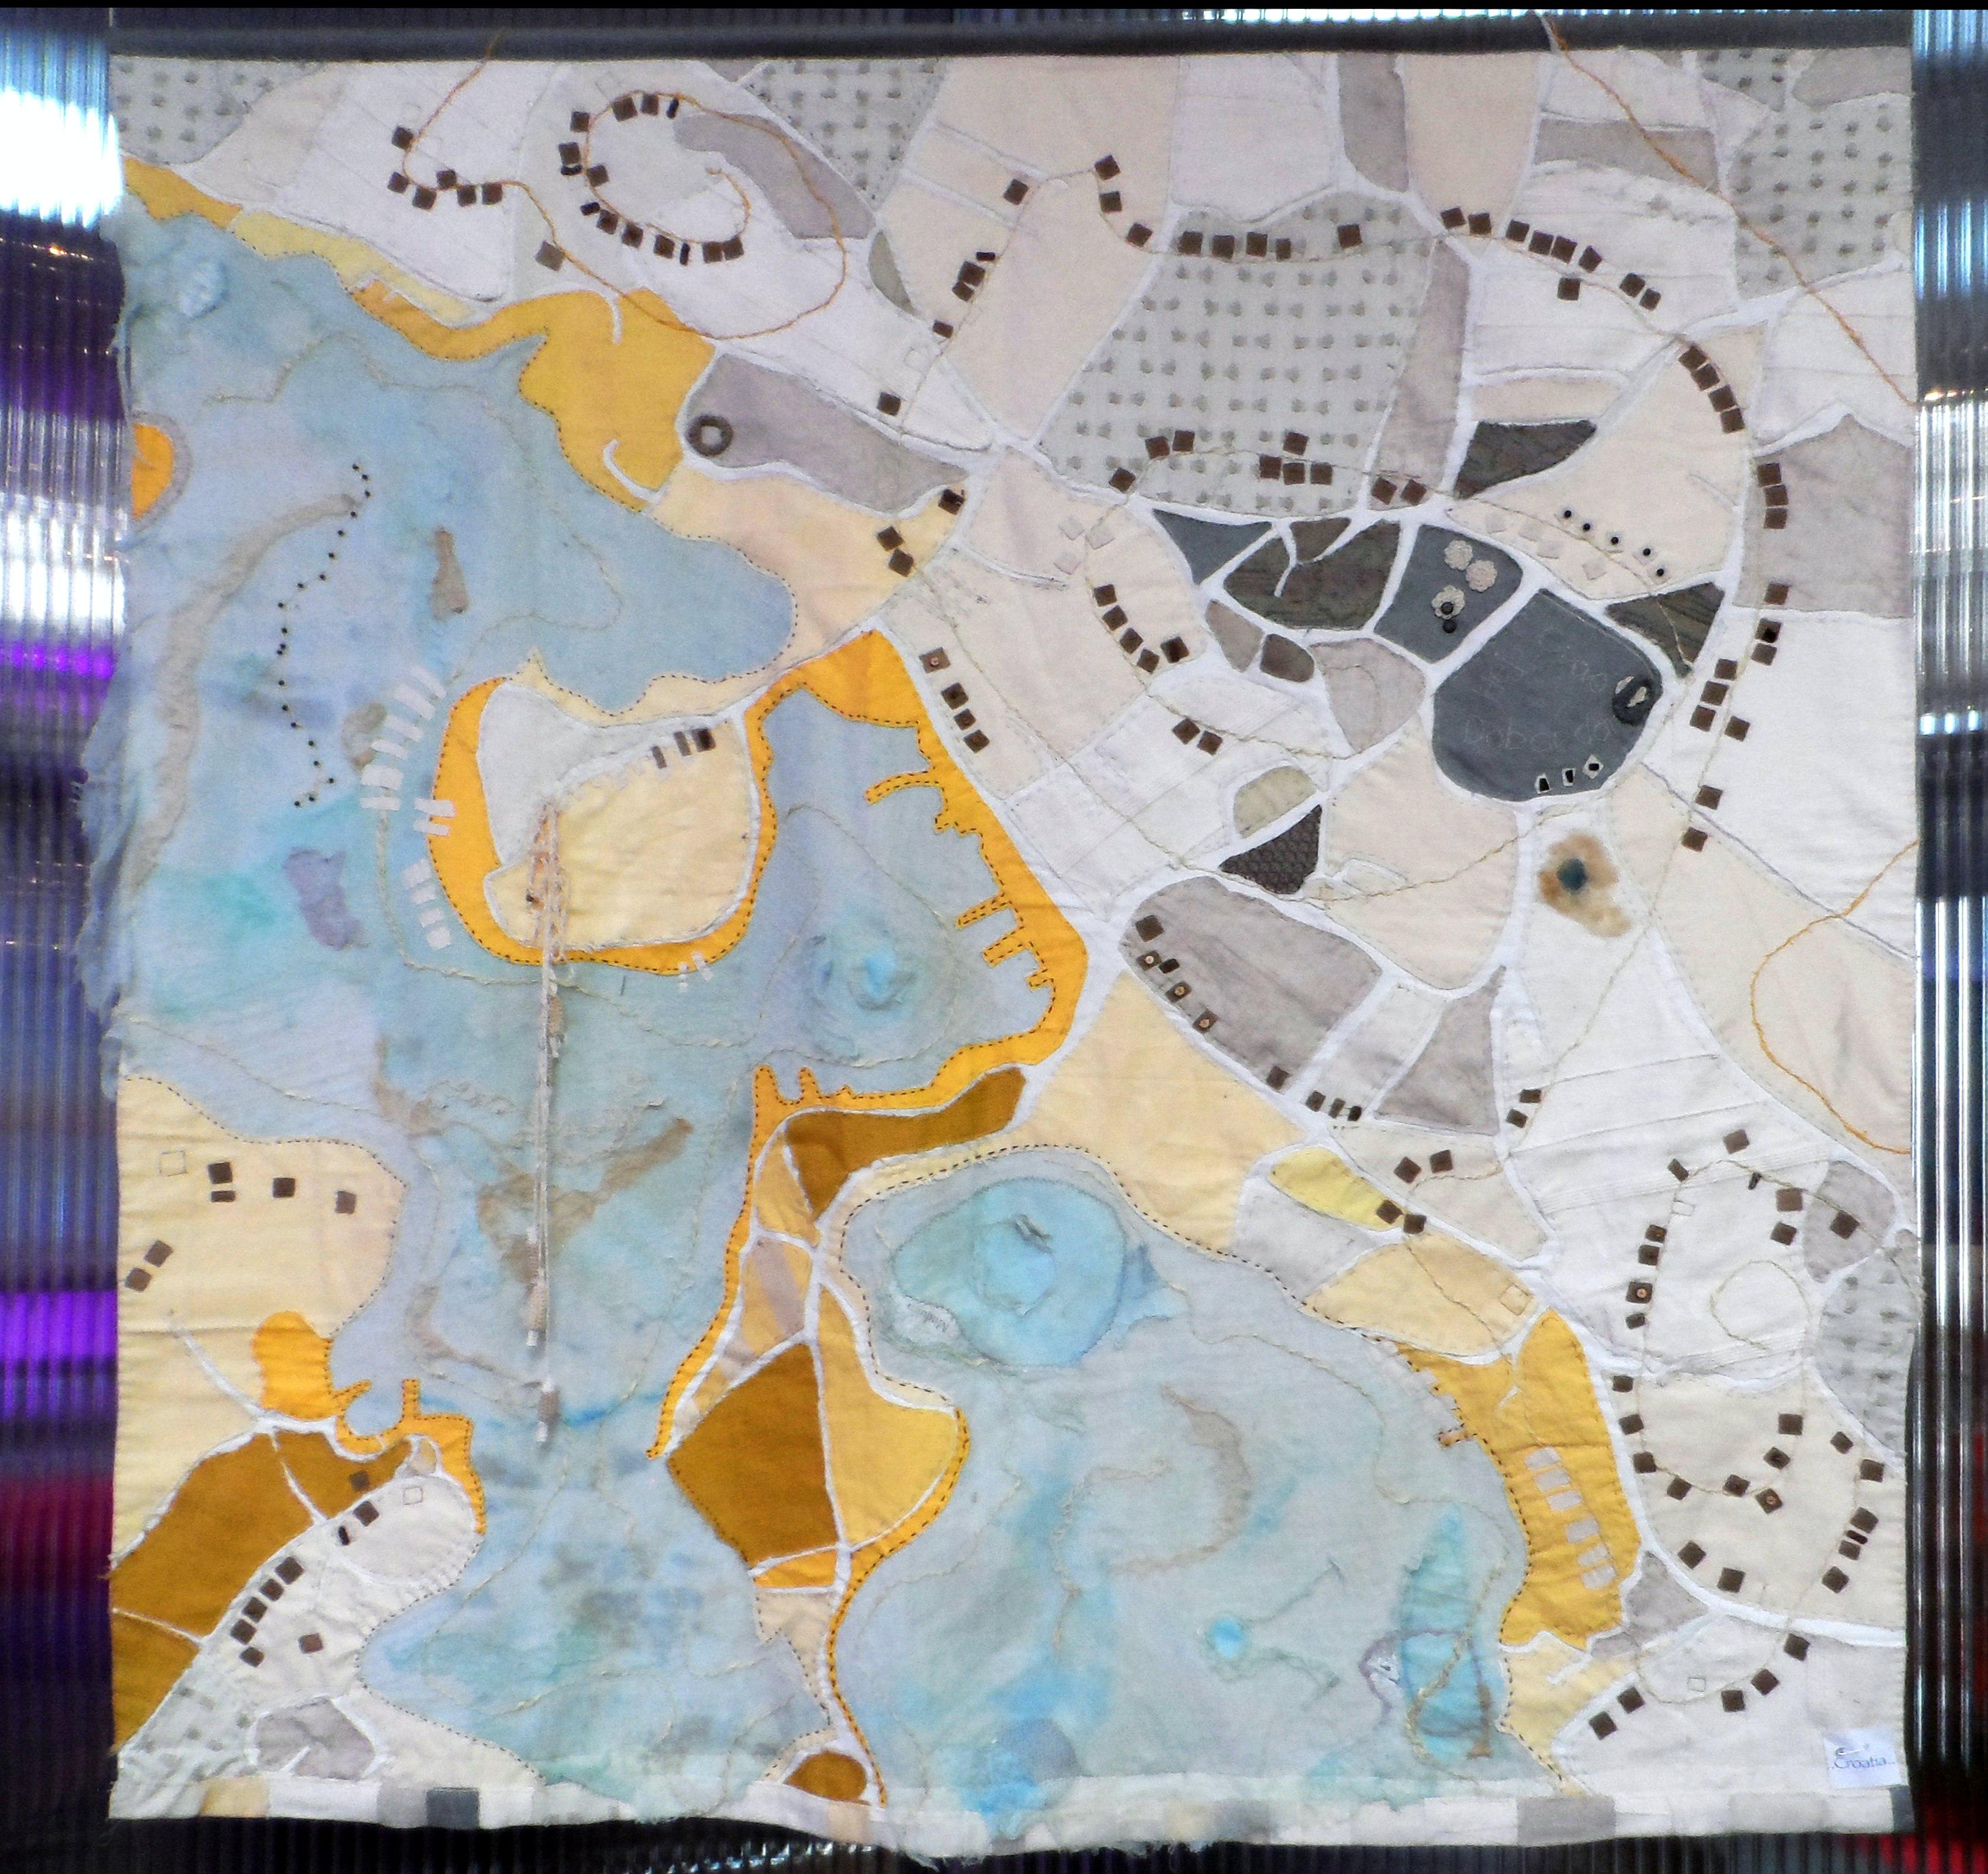 CROATIA by Nina Dragen Belic, Marija Papac, Christina Fardell, Sonja Privat, Radojka Grzinic, The Mapping Project, Fashion Hub, Liverpool 2019